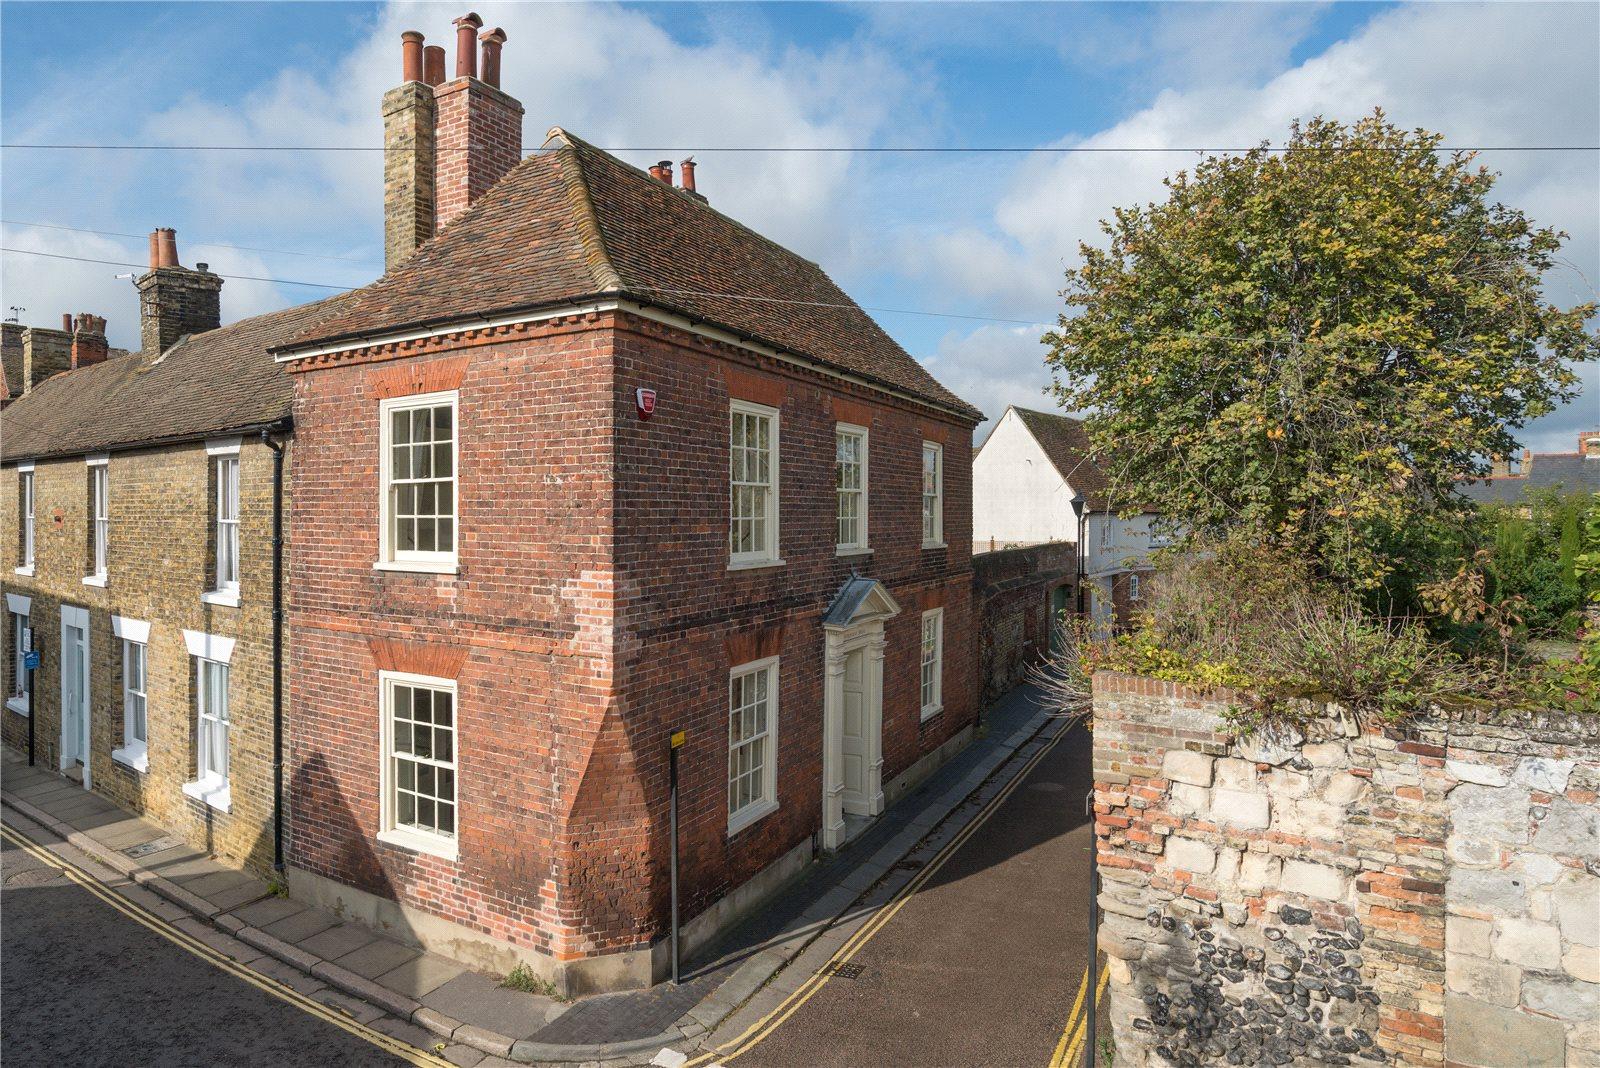 Casa para uma família para Venda às Guildcount Lane, Sandwich, Kent, CT13 Sandwich, Inglaterra